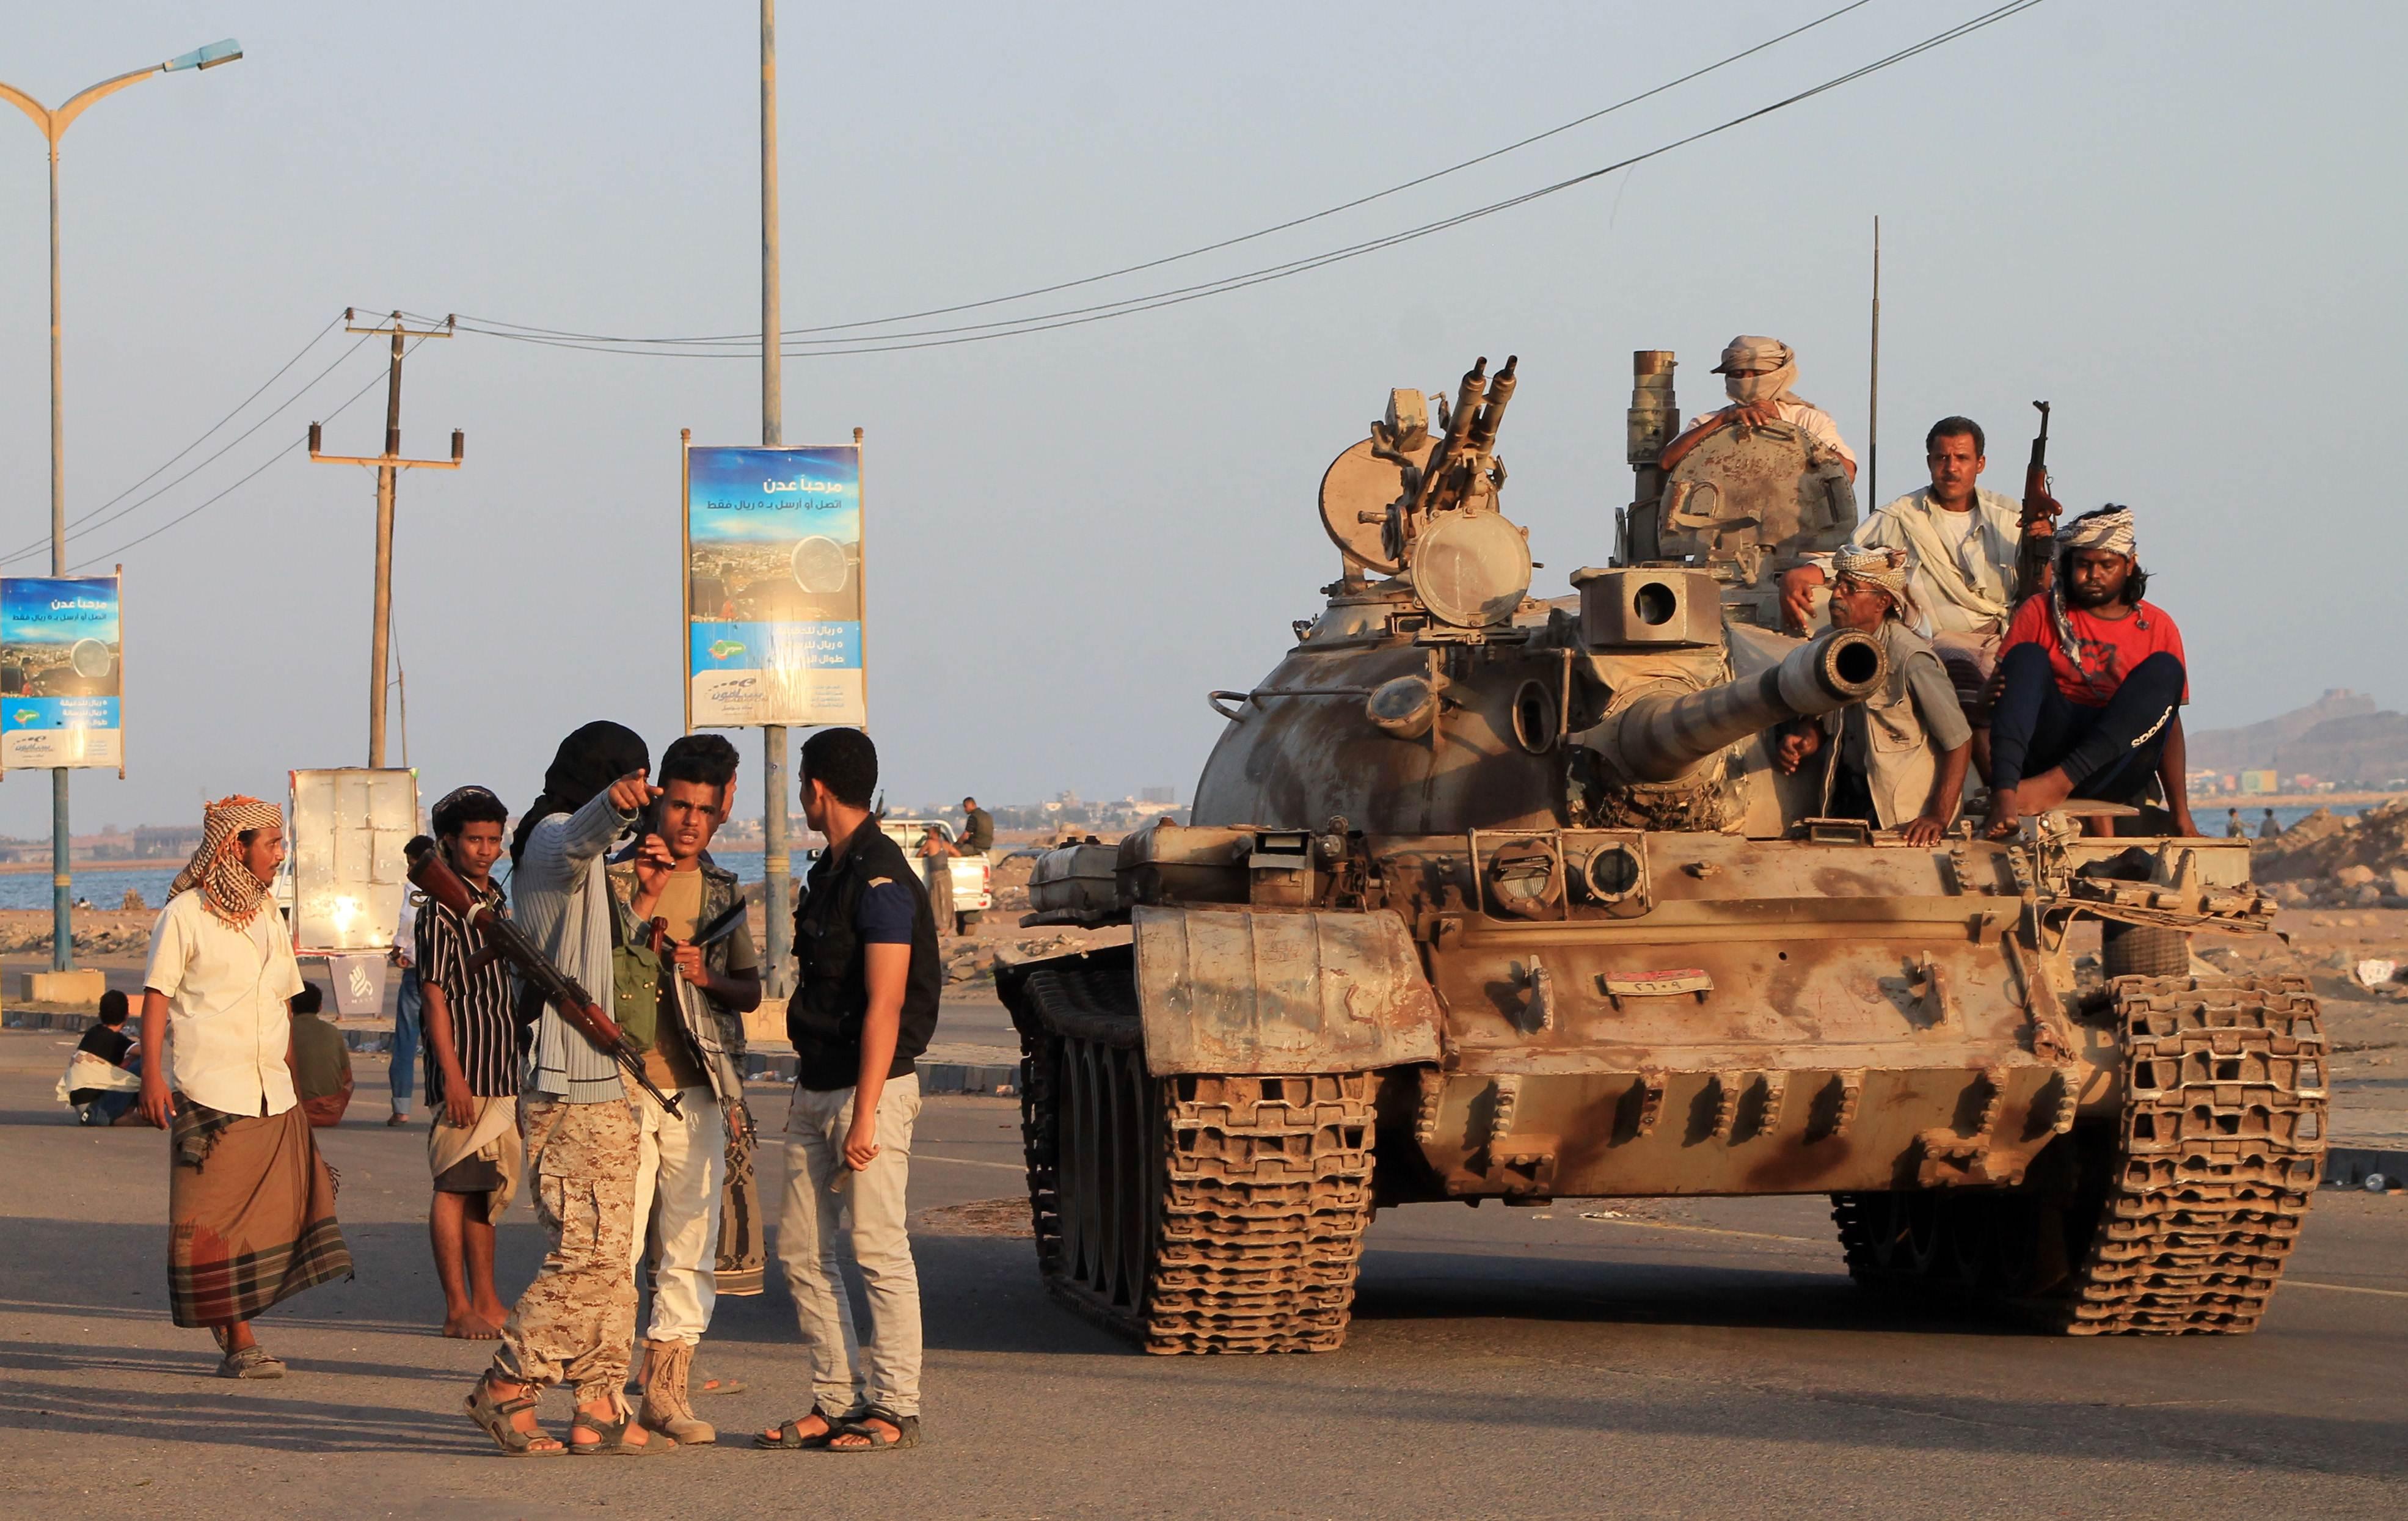 Main Houthi financier al-Jamal coming under US scrutiny